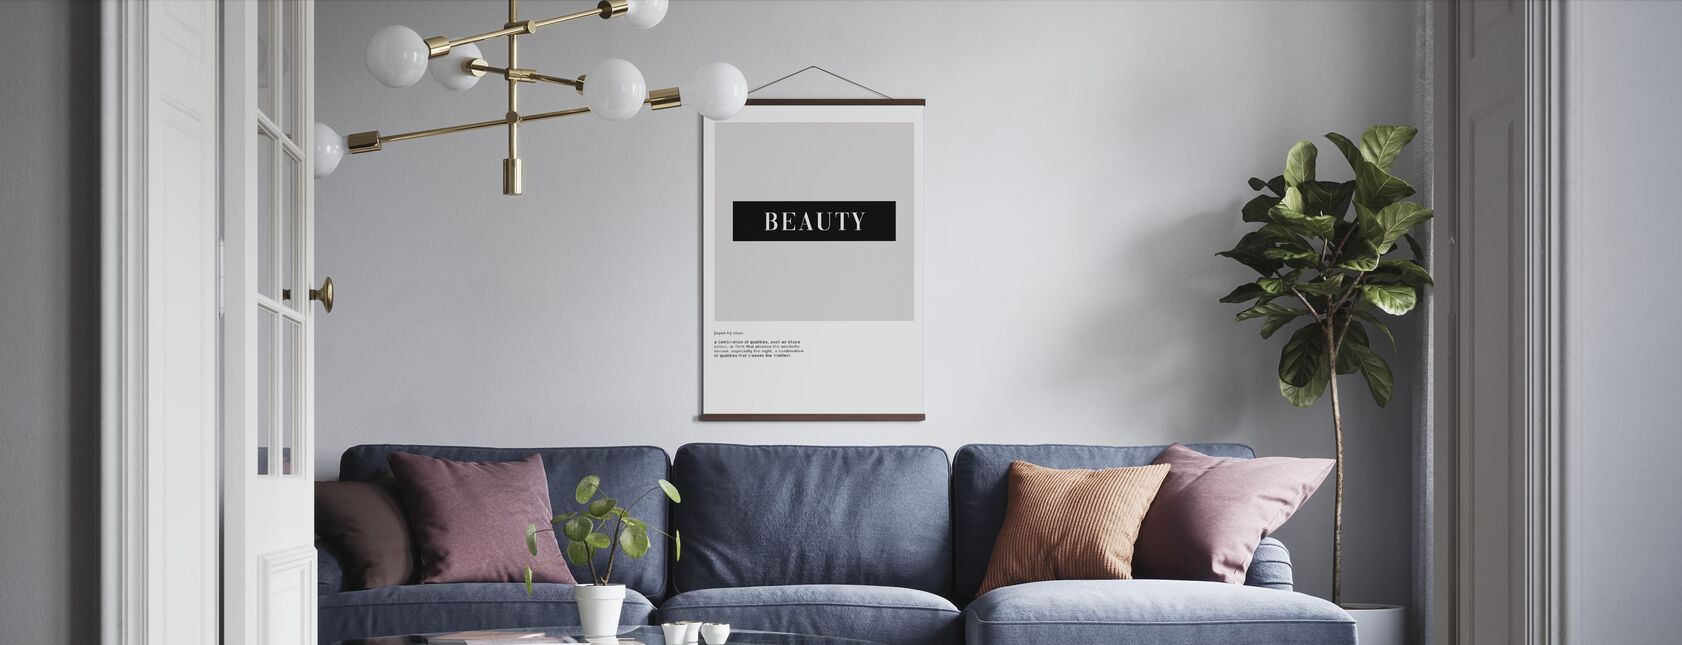 Beauty-Definition - Poster - Wohnzimmer